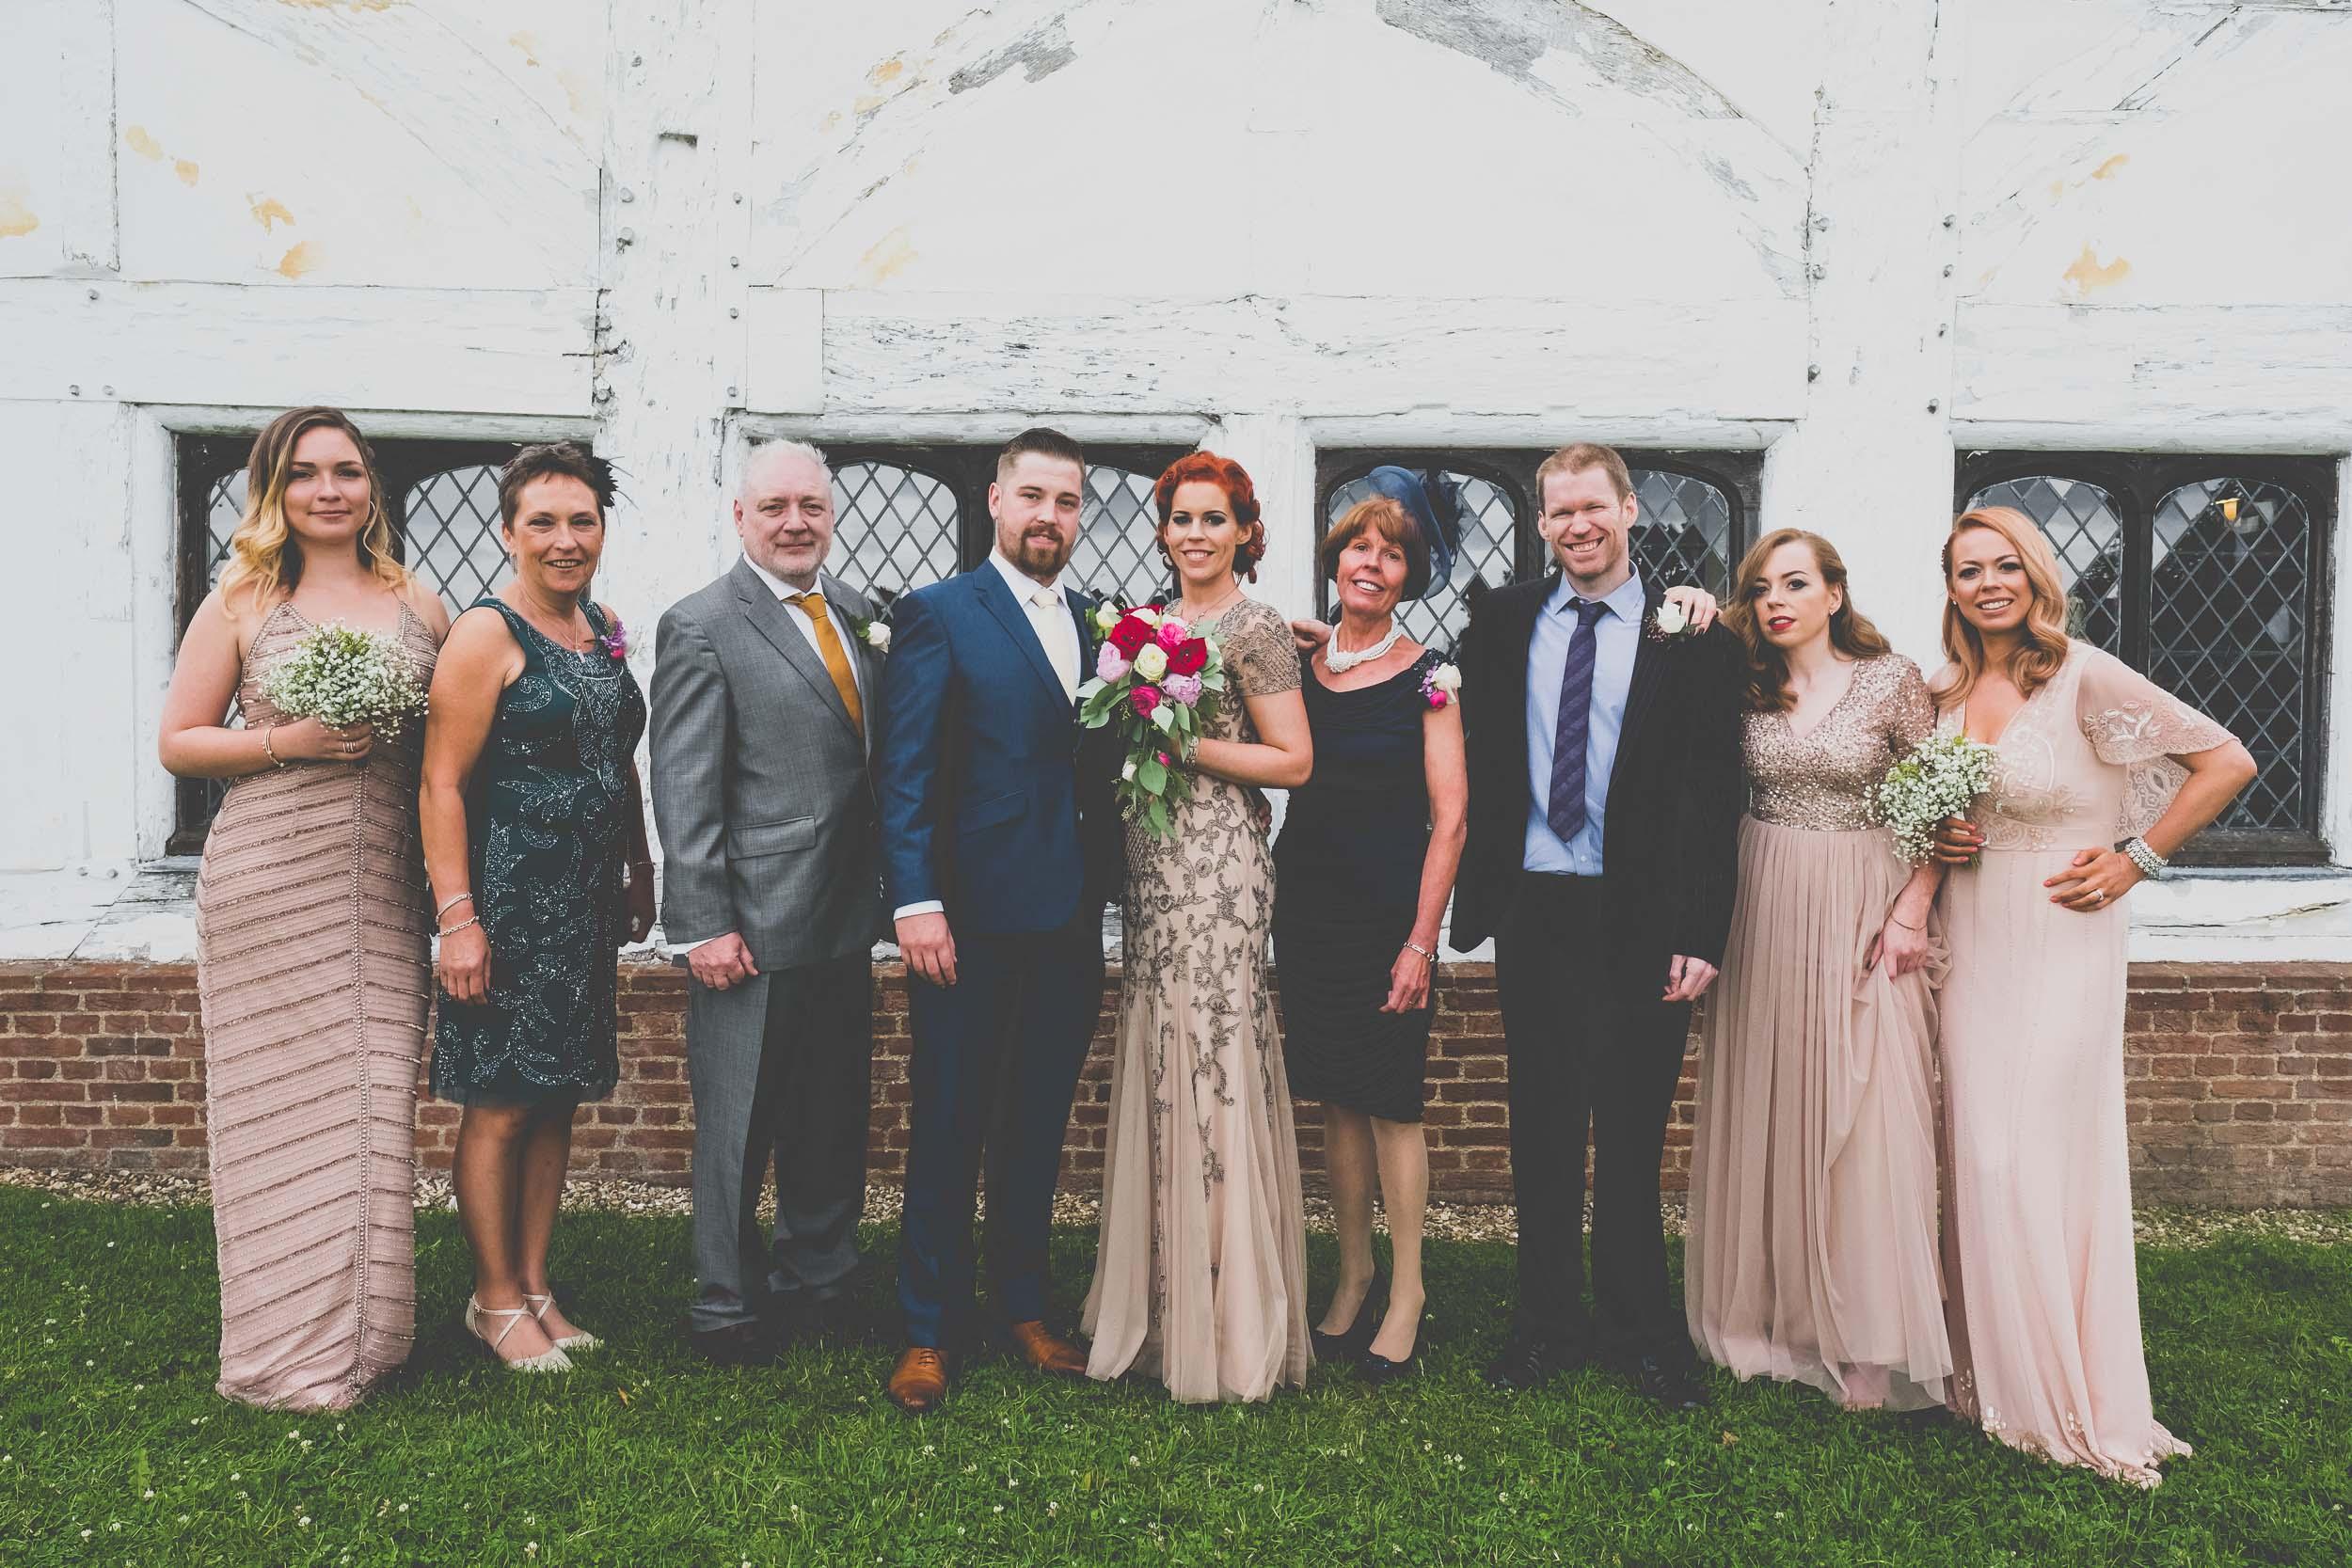 queen-elizabeths-hunting-lodge-epping-forest-wedding169.jpg